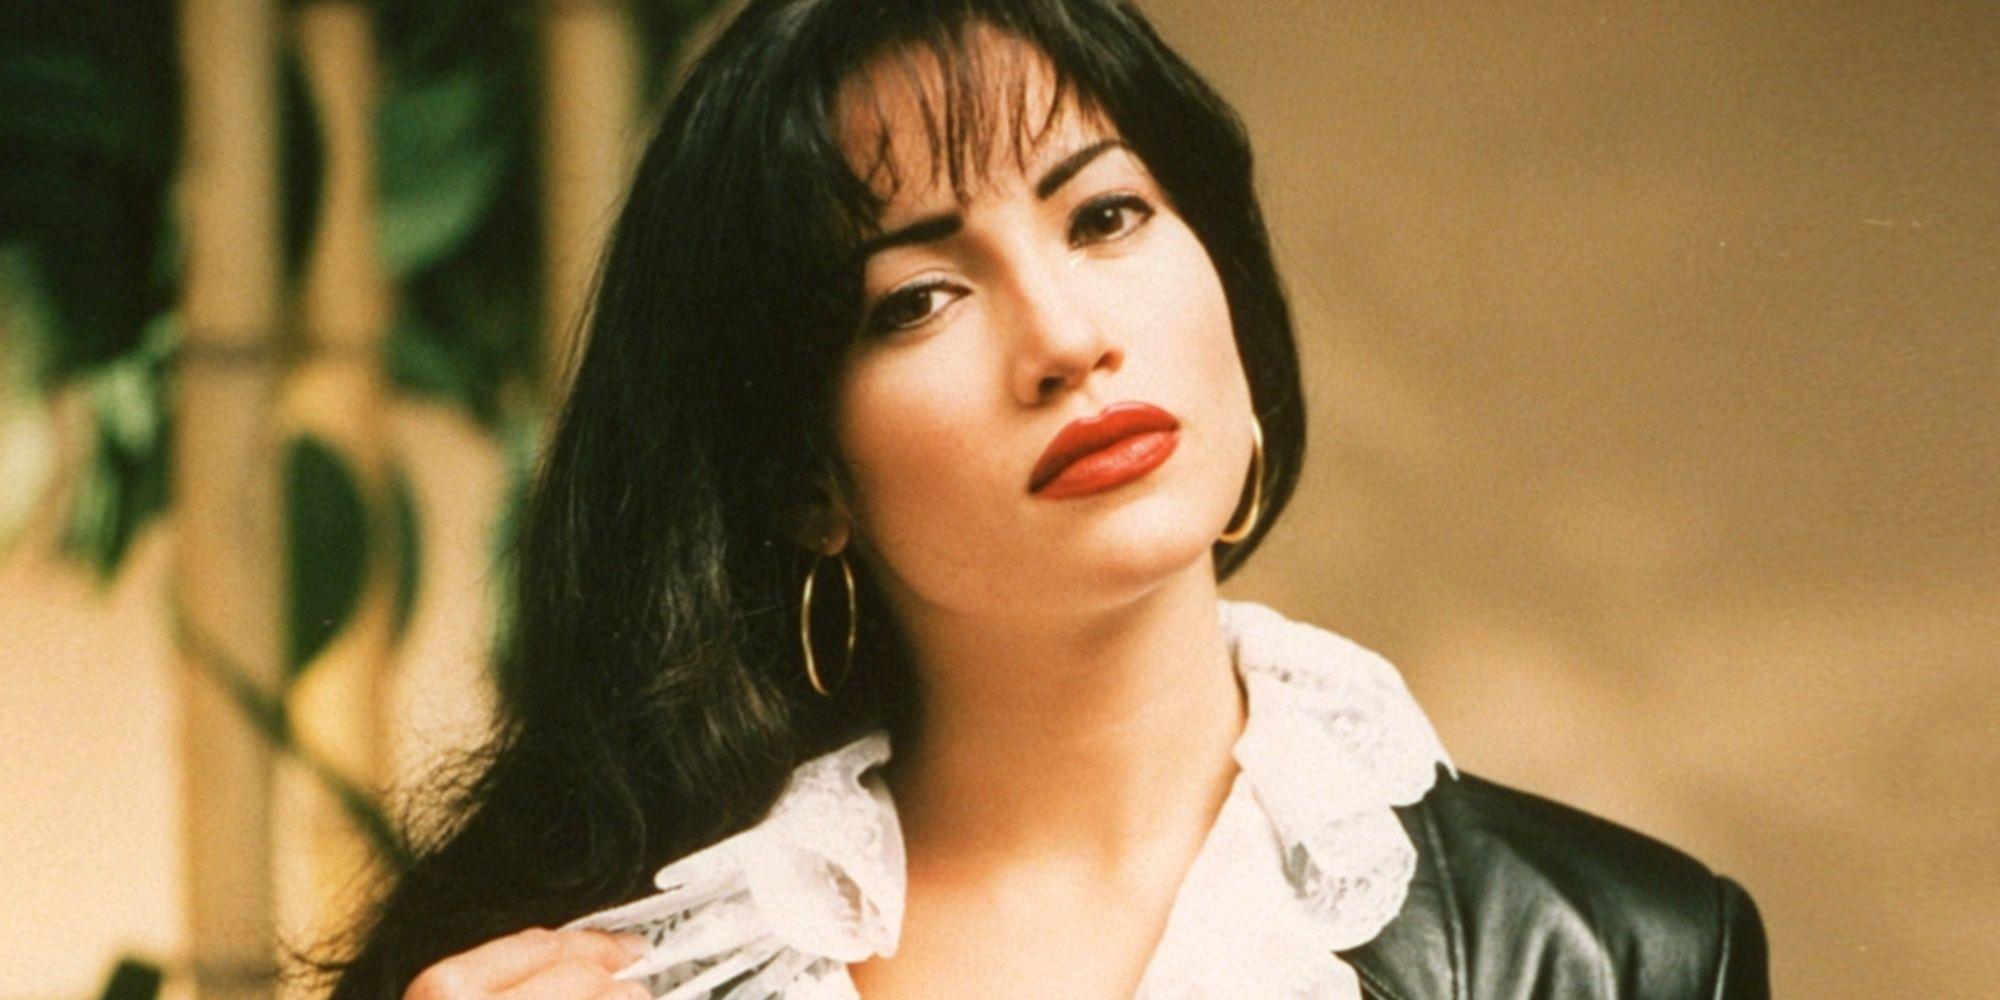 Karen Hassan,Bridget Hall USA 1998, 2001-2002 Adult clips Claire Cox,Lisa Stansfield